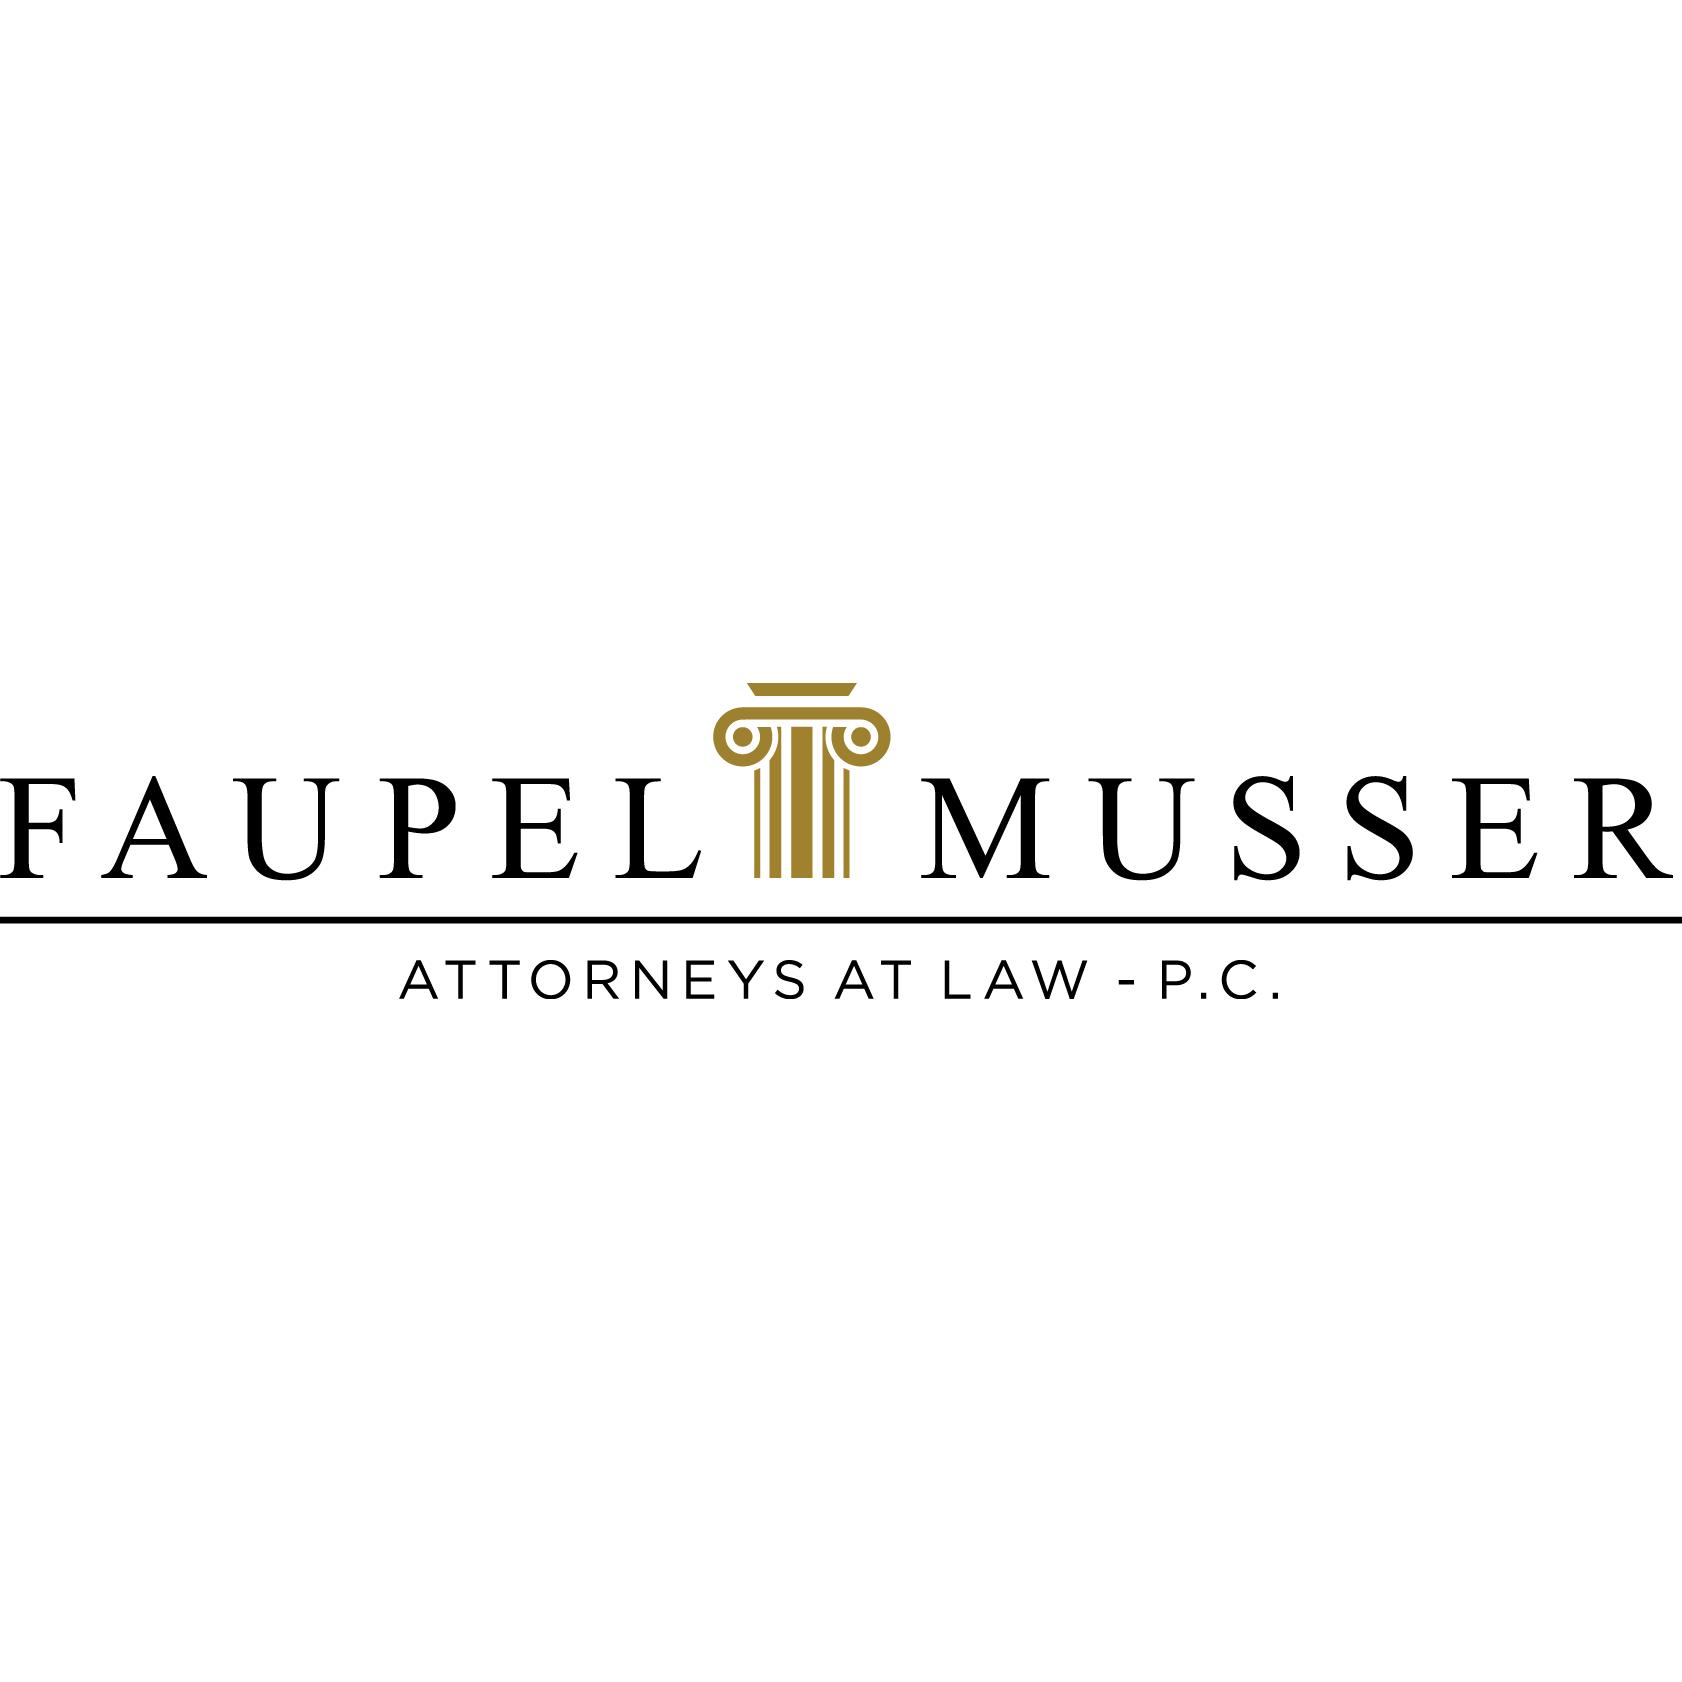 Faupel Musser Law, P.C.